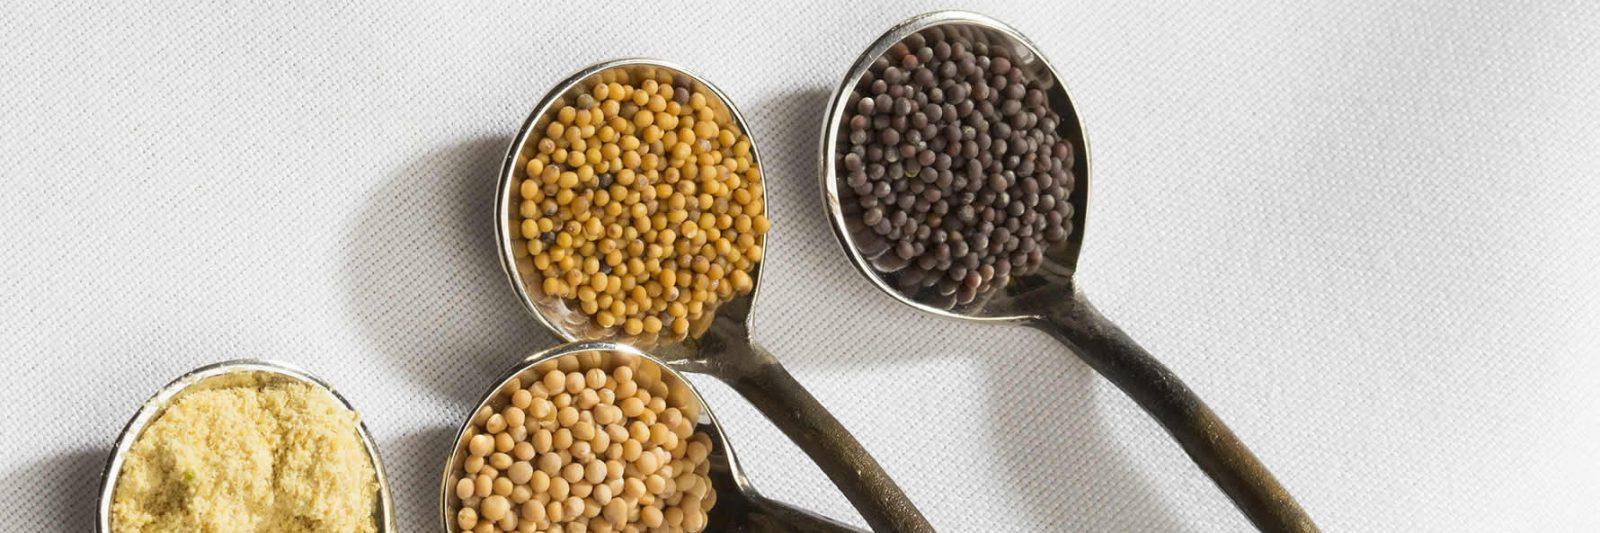 Mustard Spice Varieties